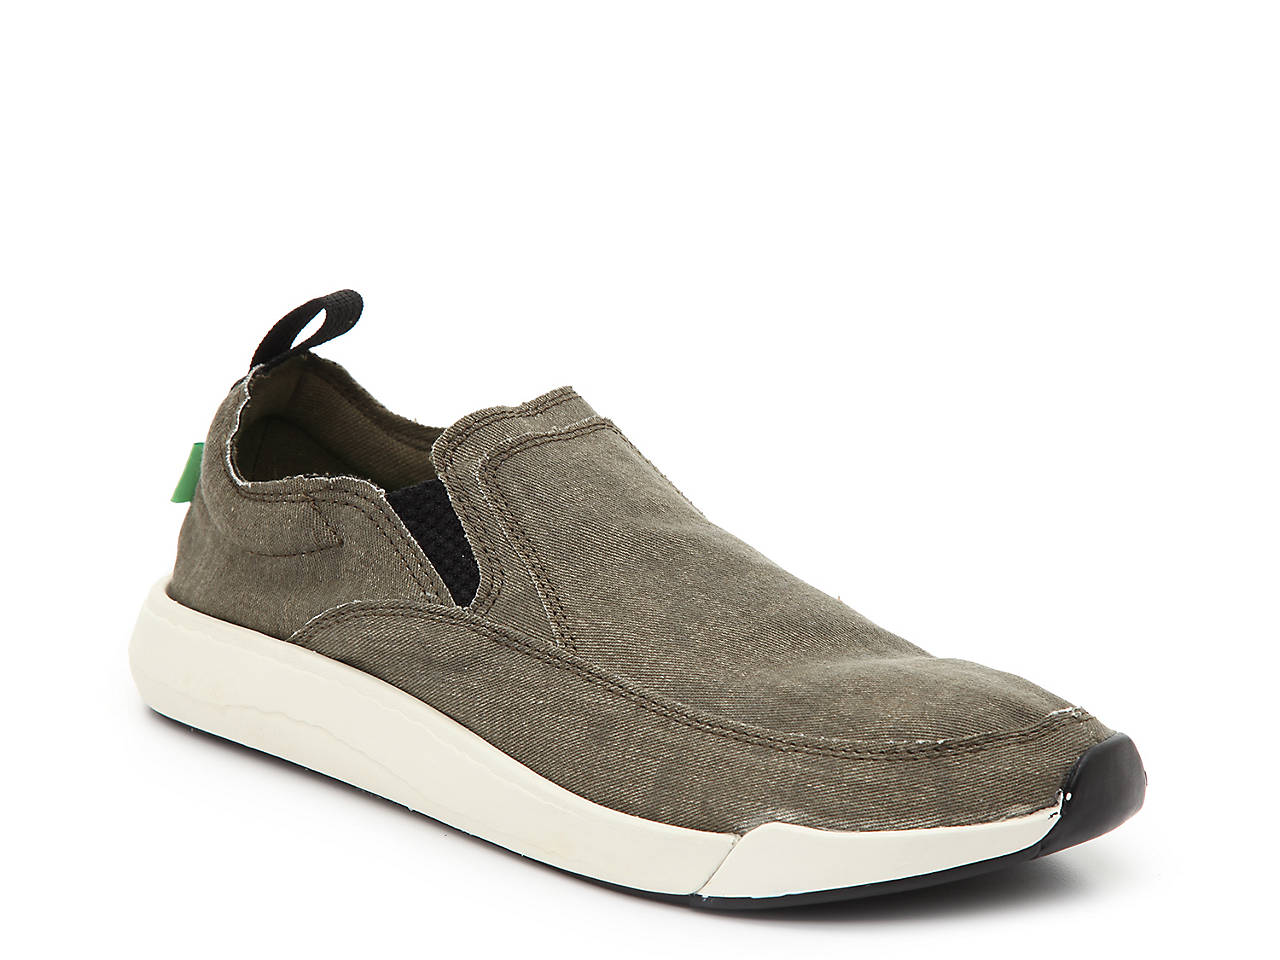 7a4cc95efb5a0 Chiba Quest Slip-On Sneaker